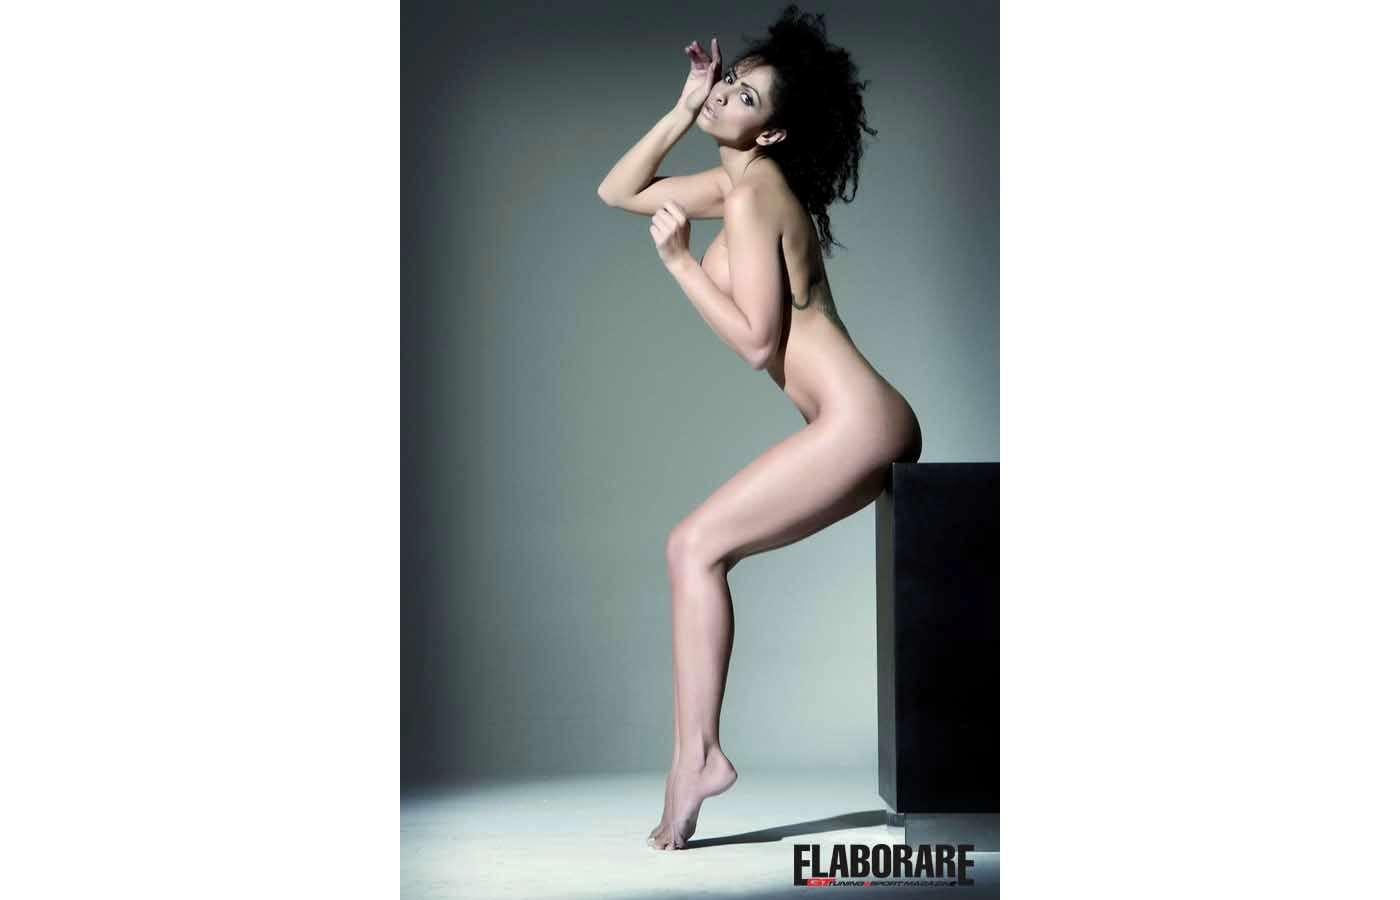 Top Girls brasiliana Daniele Moraes